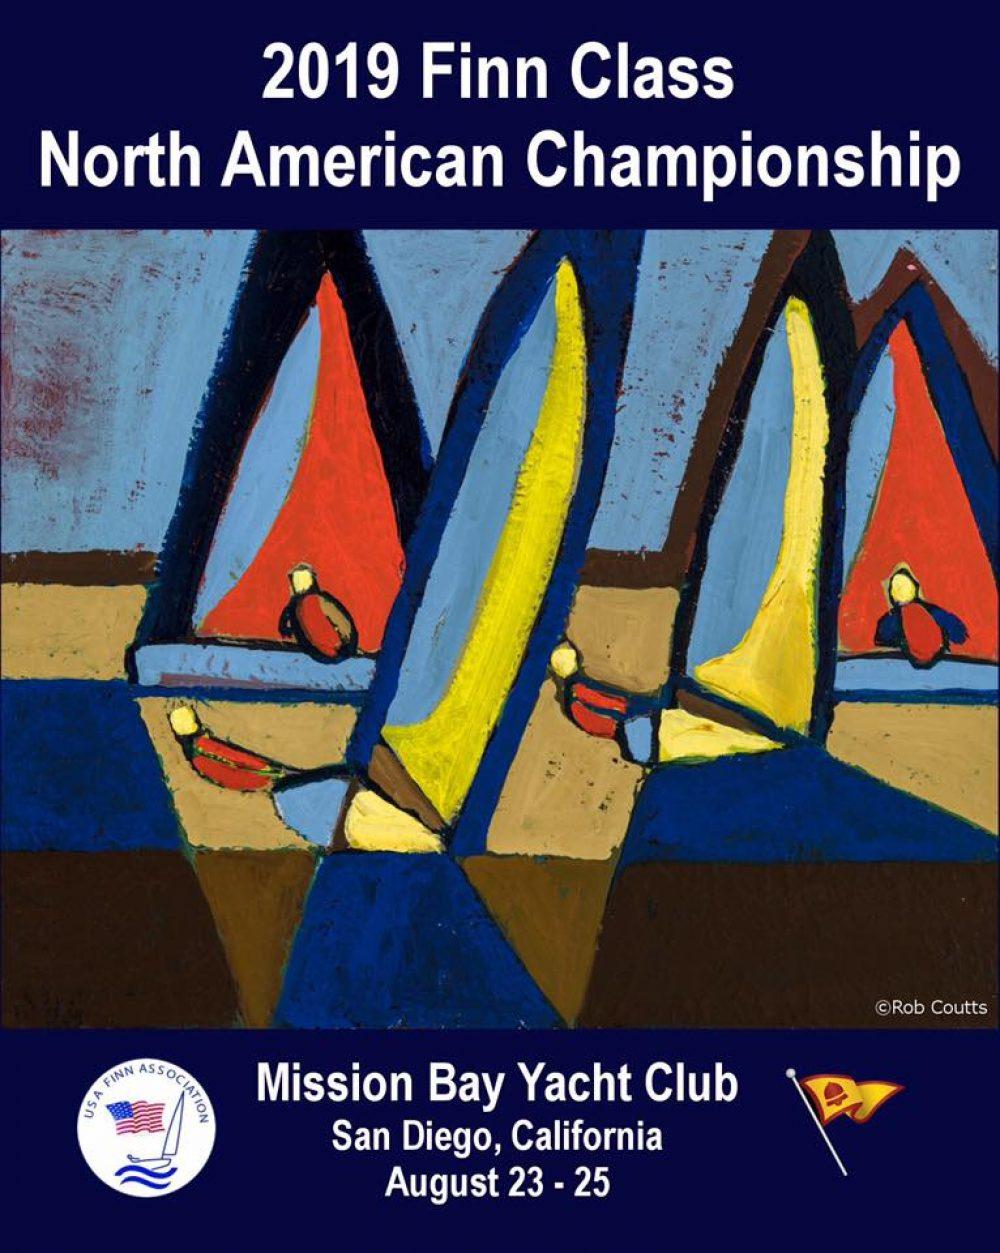 2019 Finn North American Championship